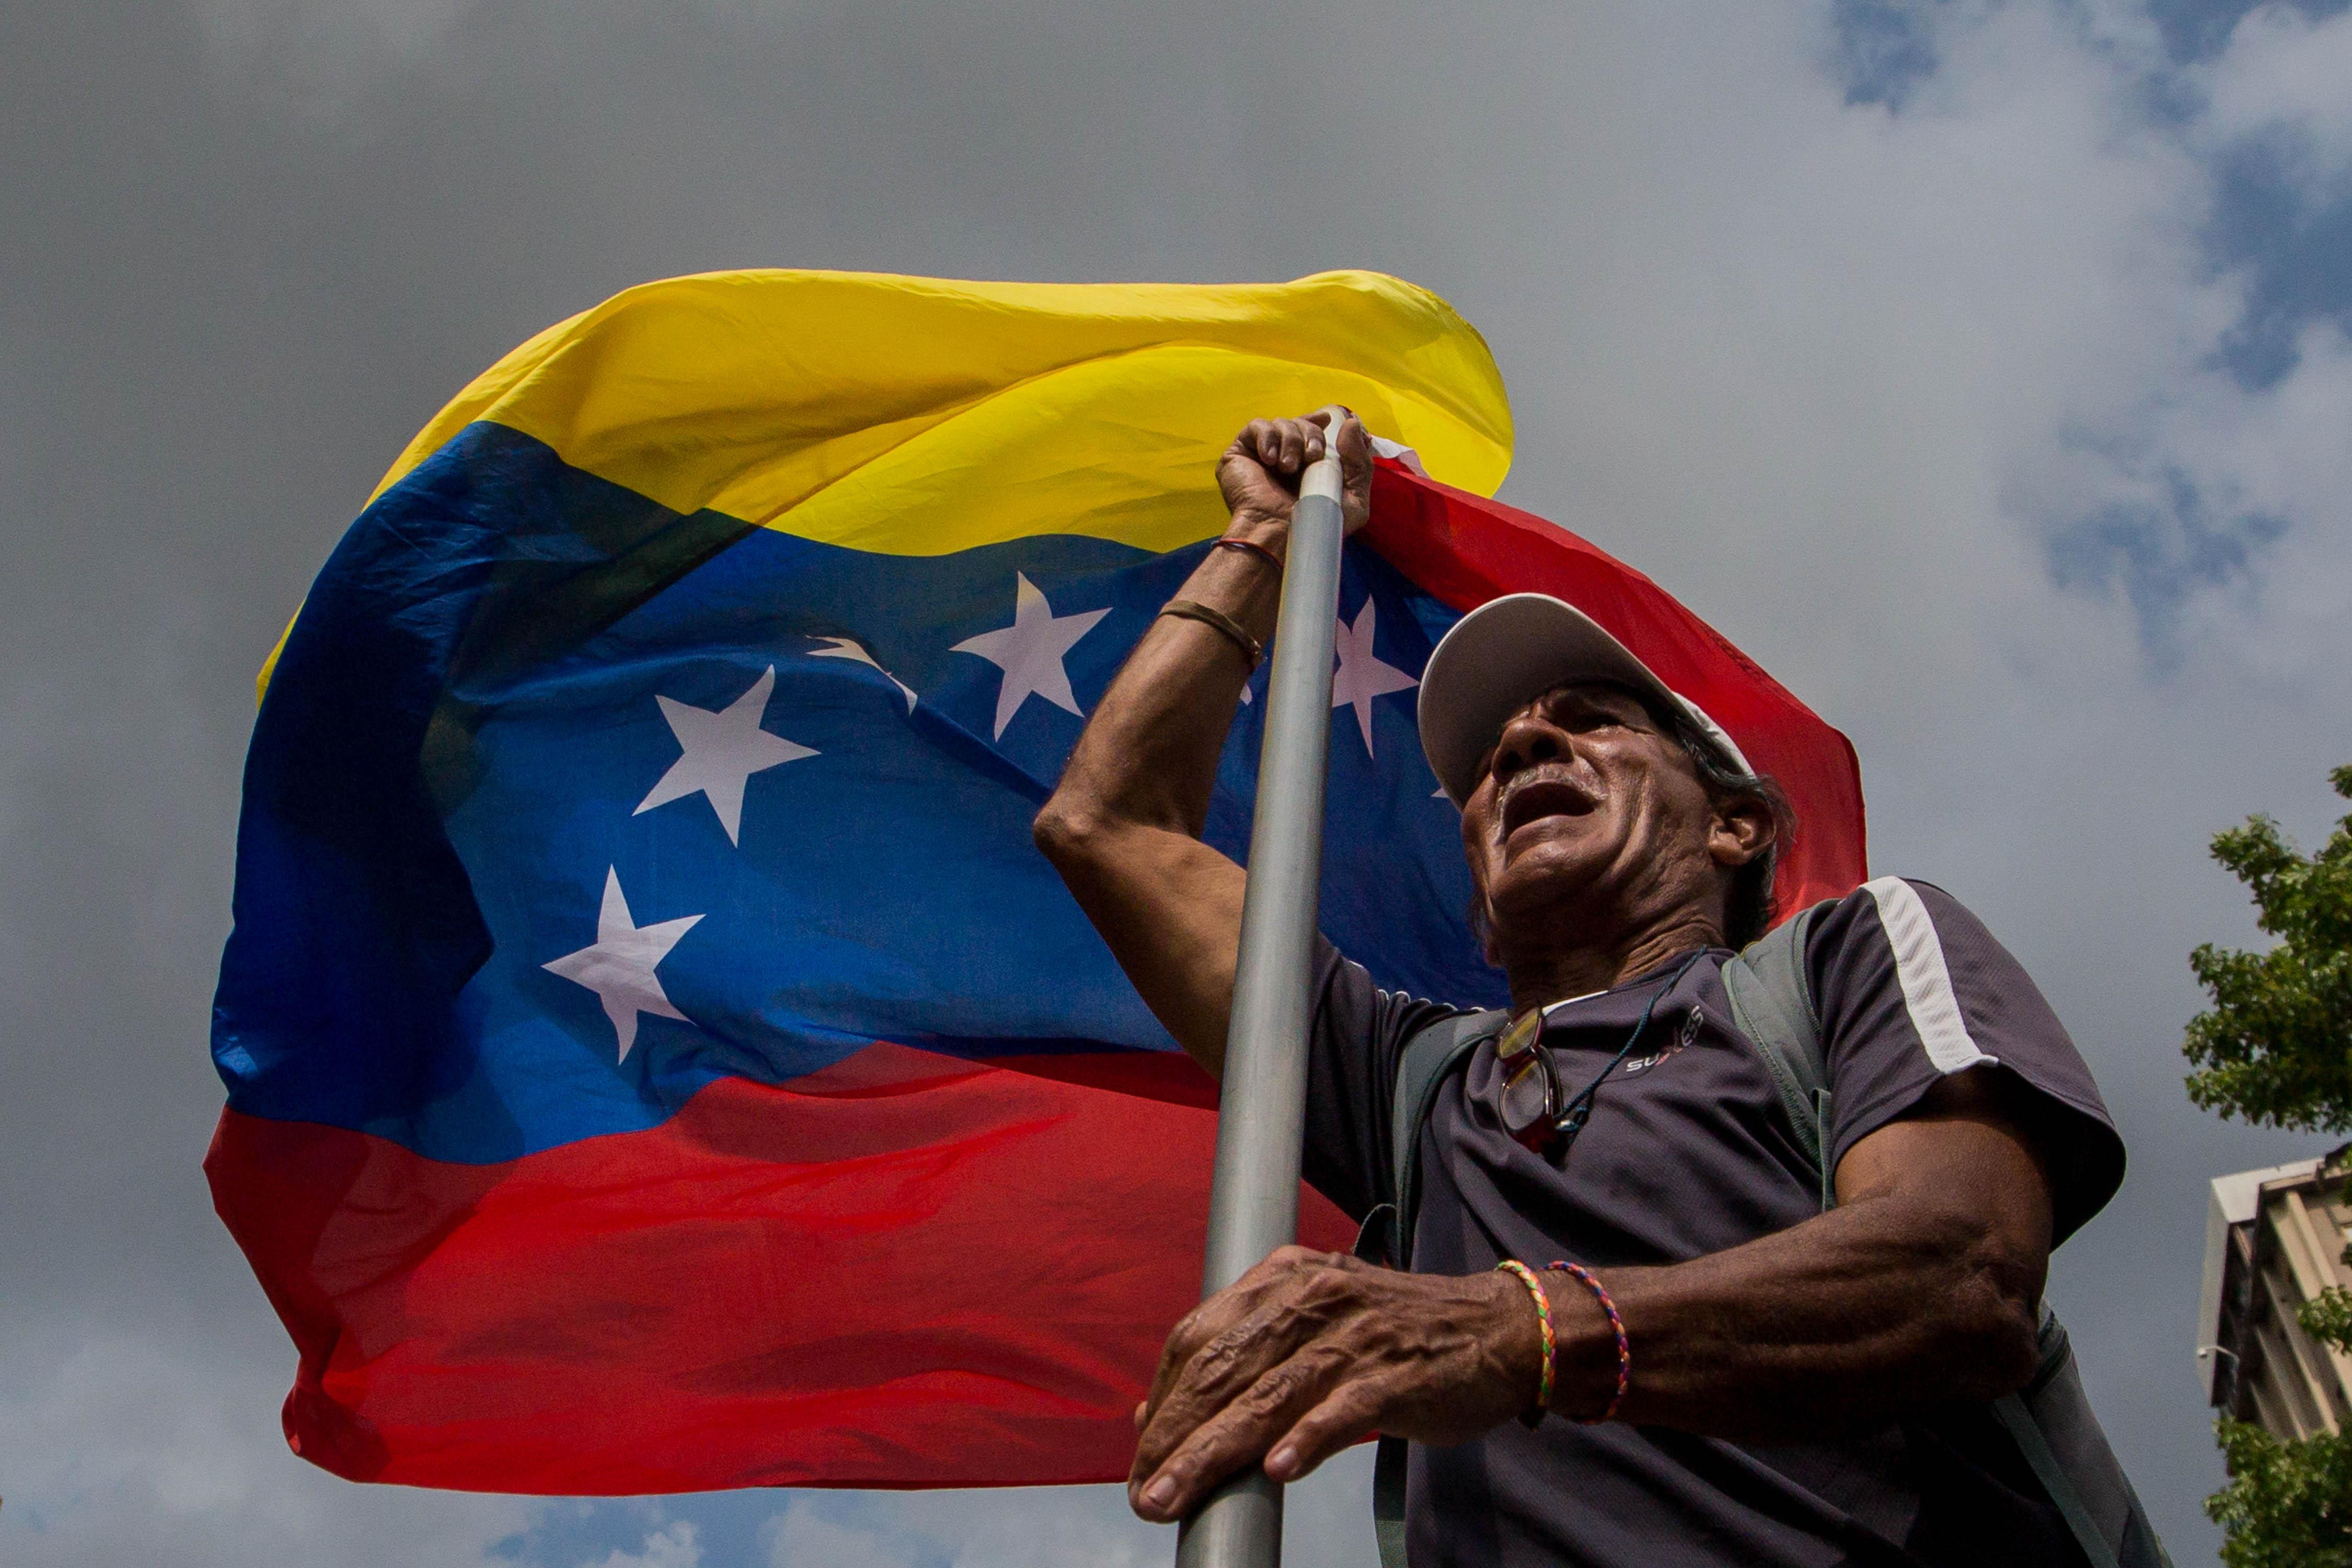 Simpatitzants del Govern del president Nicolás Maduro marxen en suport al procés constituent a Caracas (Veneçuela). /MIGUEL GUTIÉRREZ